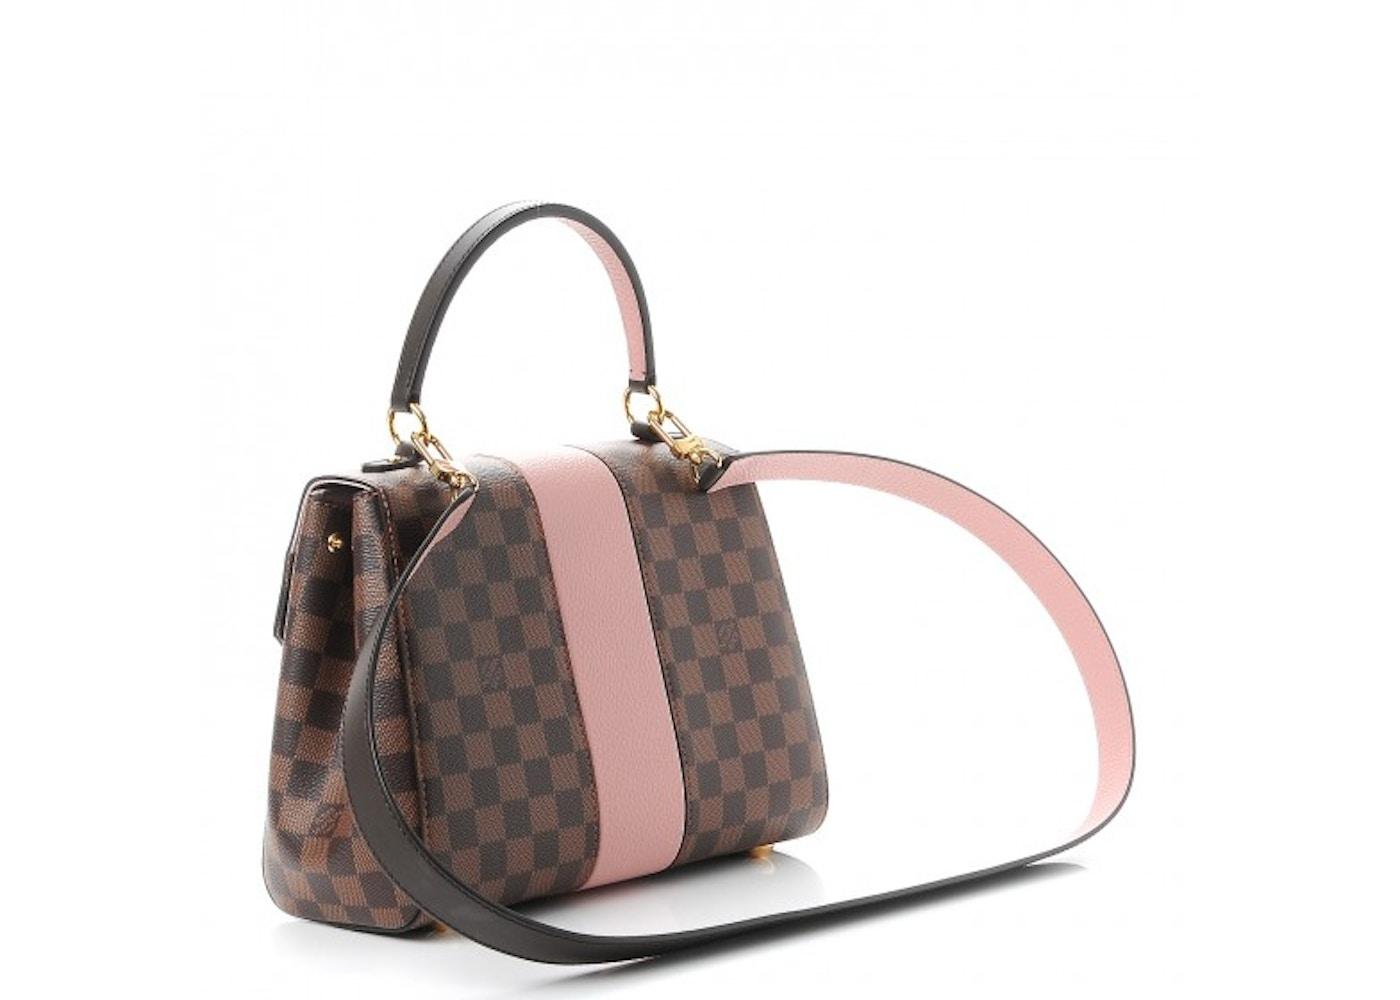 cf6de964995 Louis Vuitton Tote Bond Street Damier Ebene Magnolia